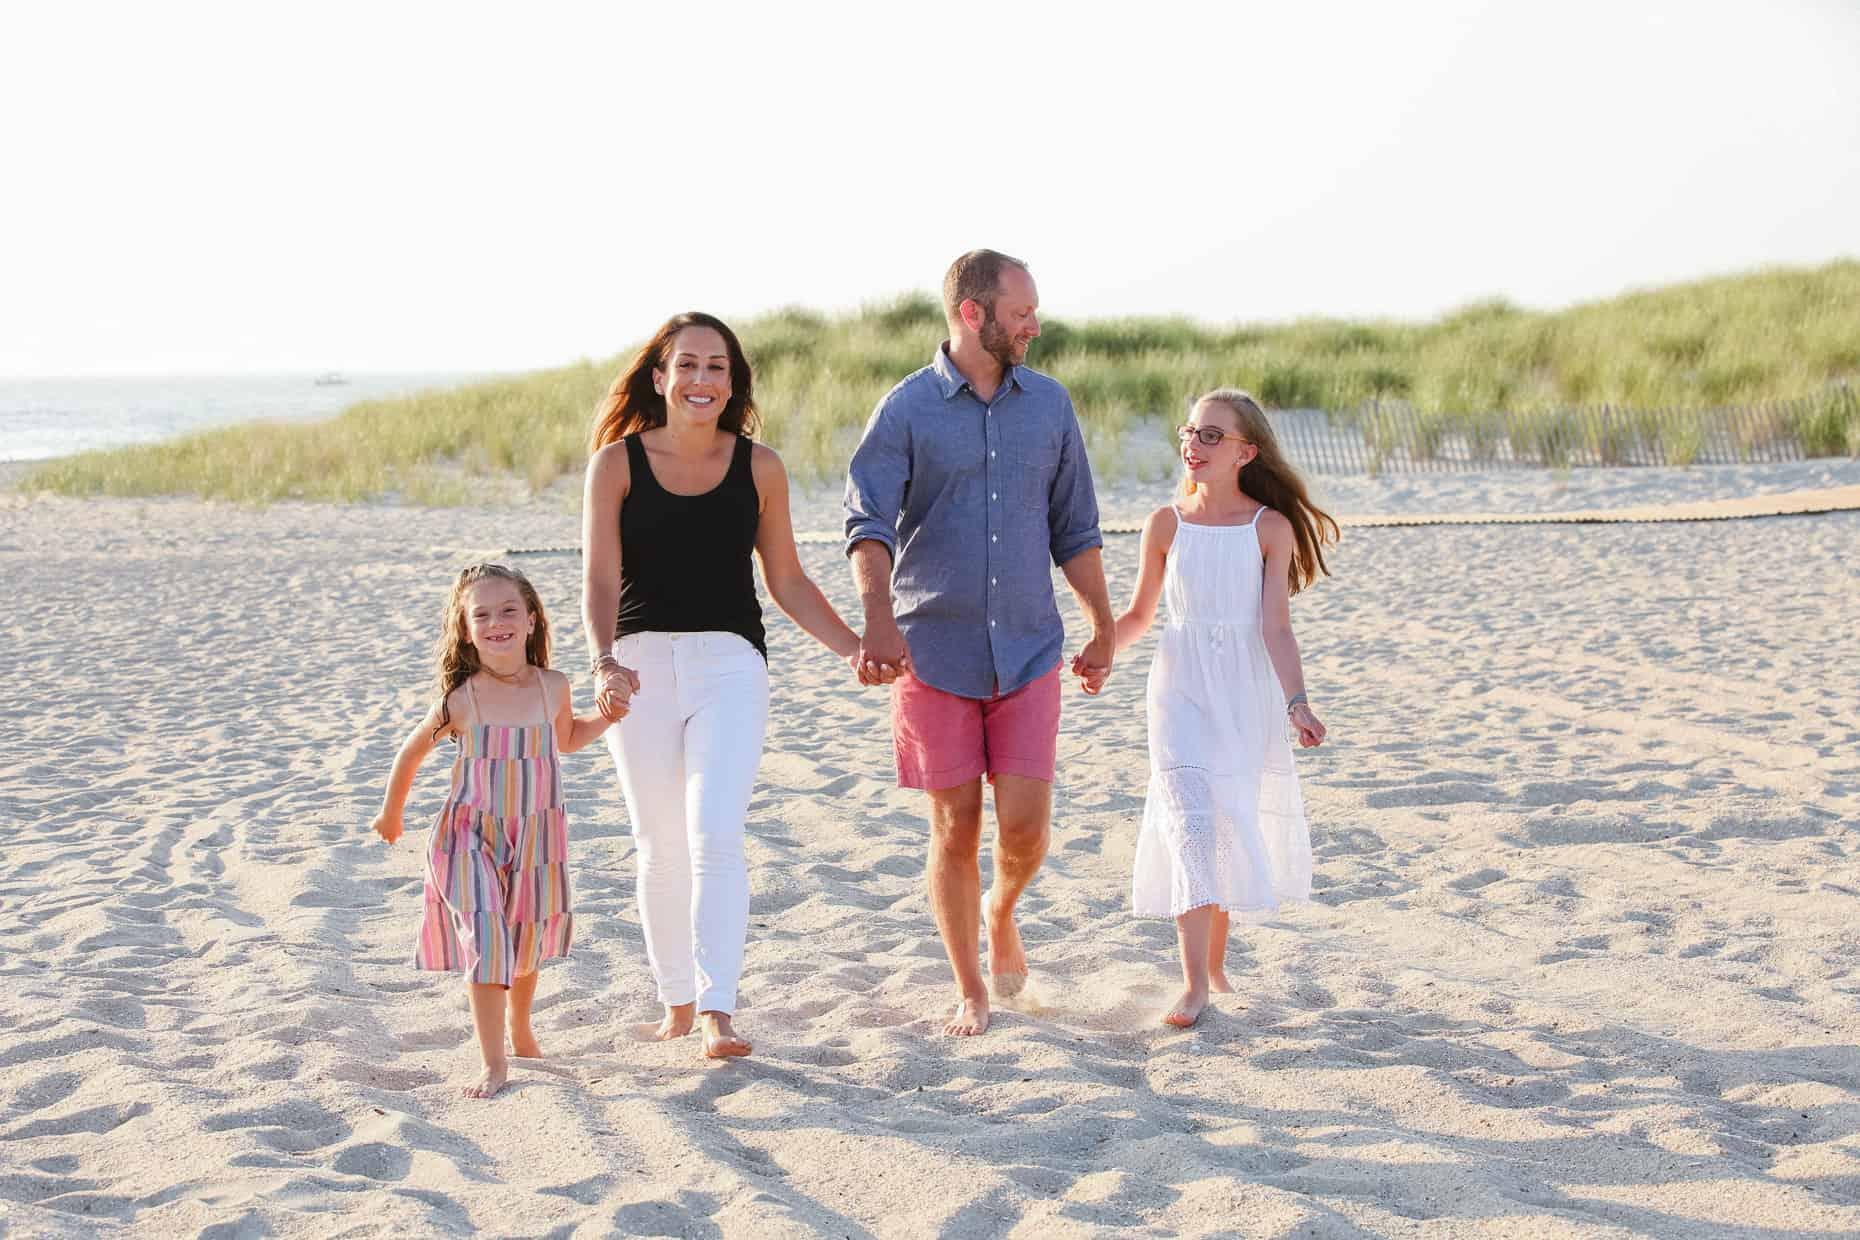 Family Photography Cape May